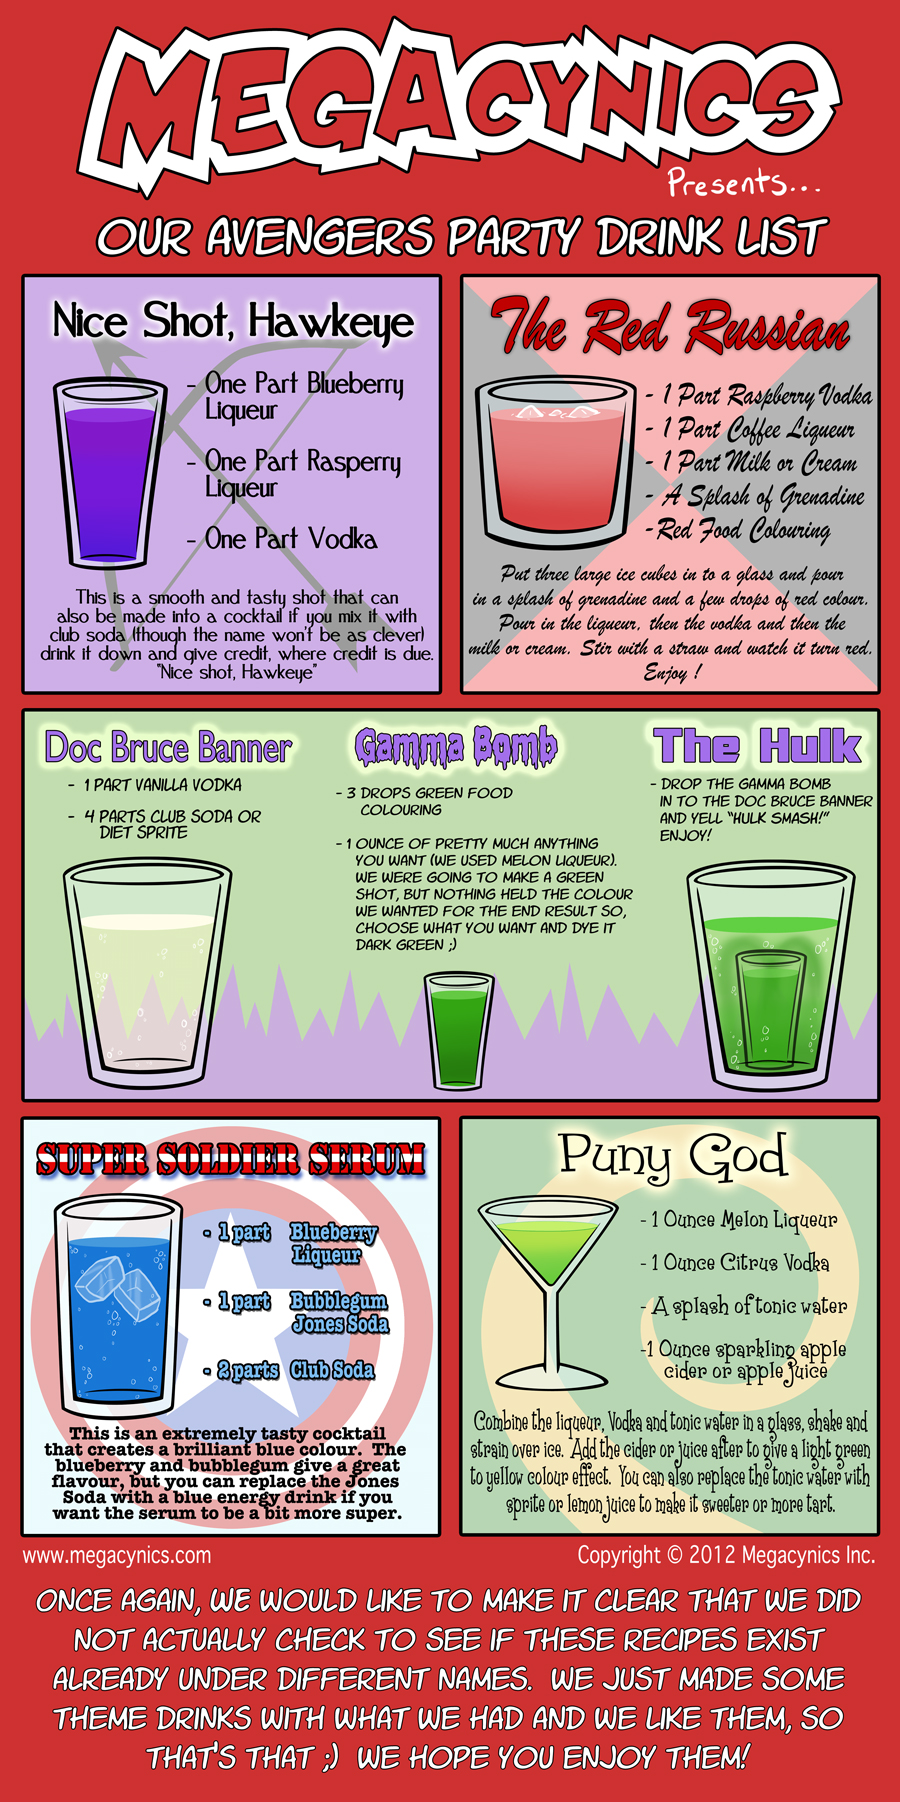 MegaCynics: Avengers Drink List (Sep 28, 2012)